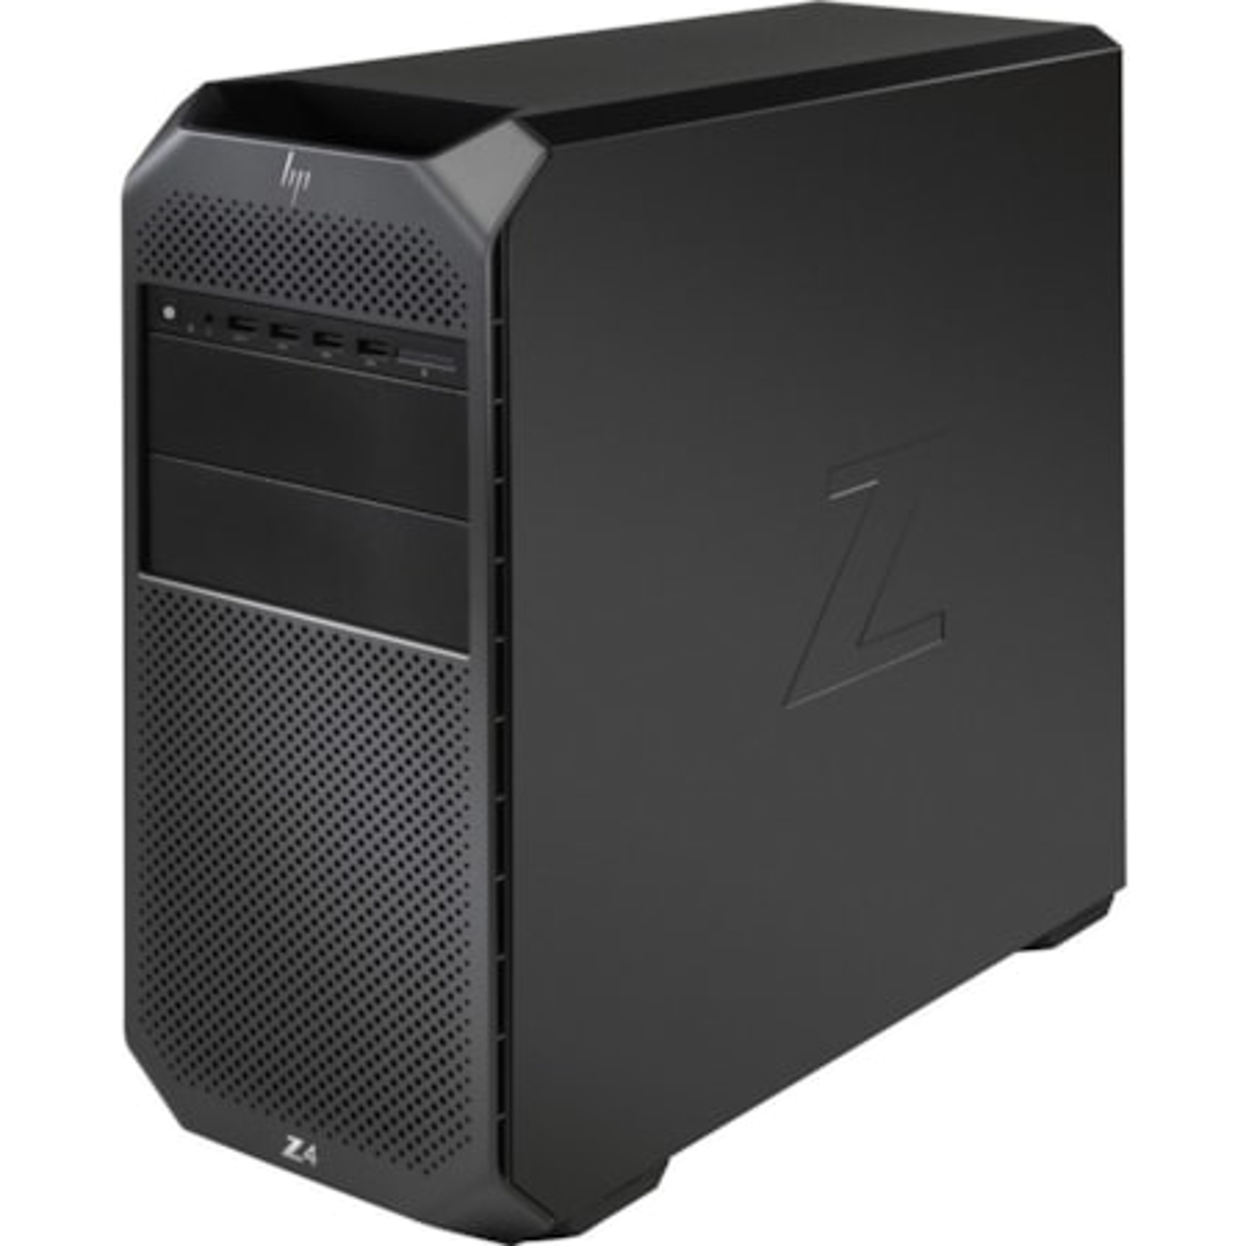 HP Z4 G4 Workstation - 1 x Xeon W-2104 - 16 GB RAM - 256 GB SSD - Mini-tower - Black